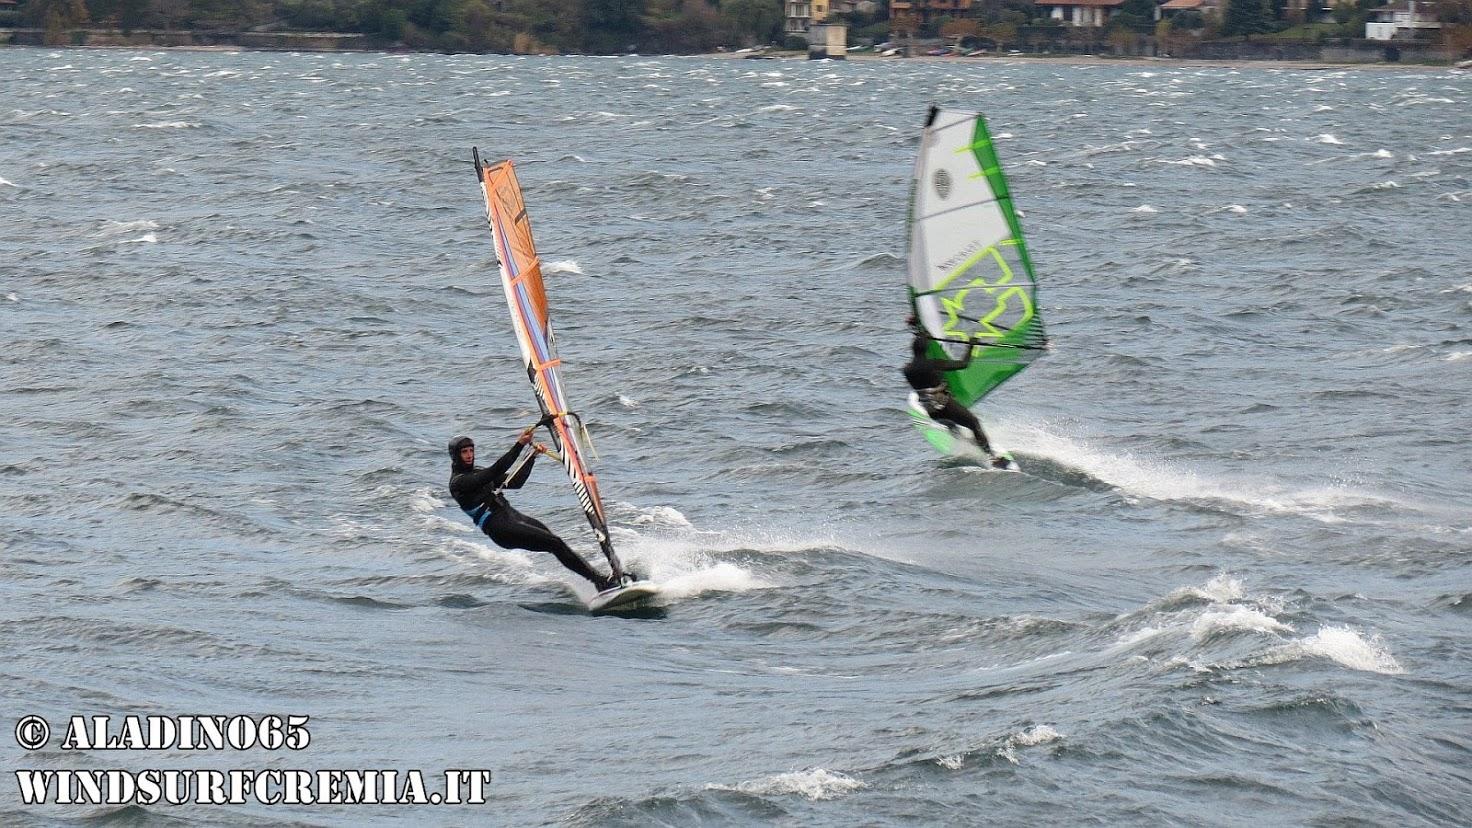 windsurf_cremia_13112017_065.jpg